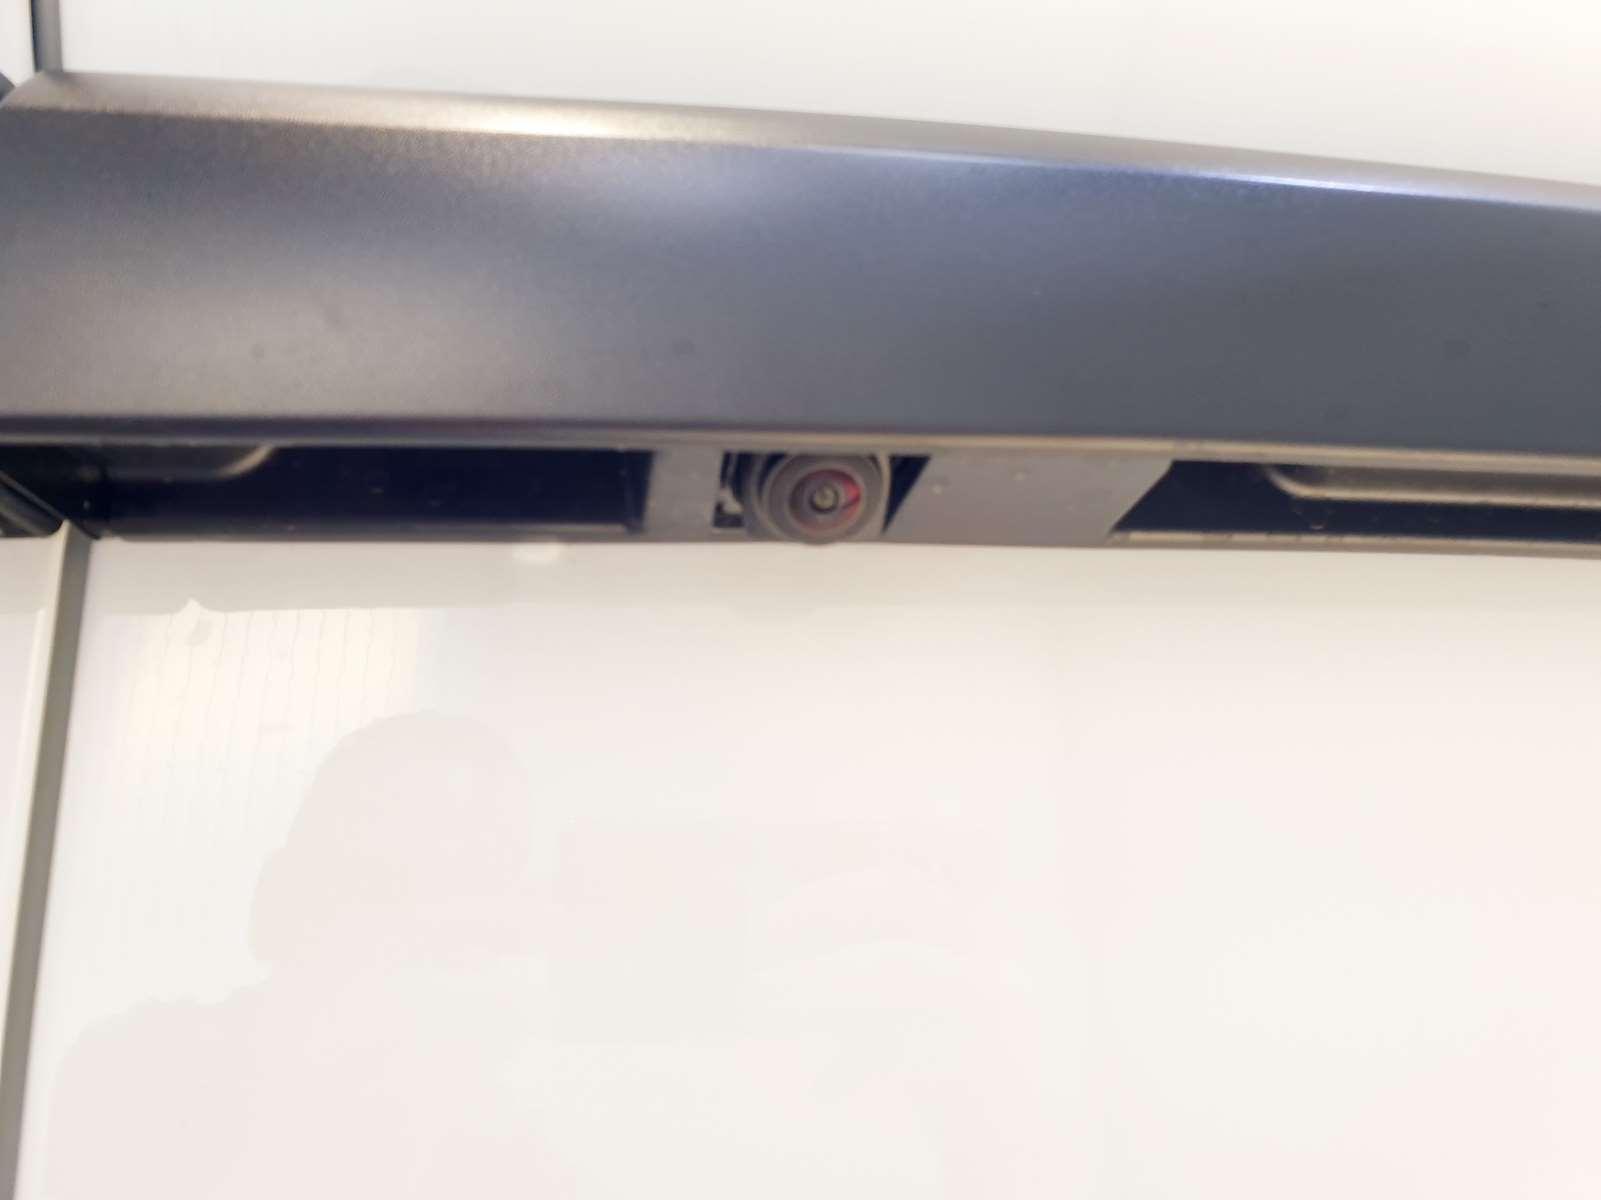 Miniature DACIA DOKKER Blue dCi 95 - 2020 Stepway CAMERA